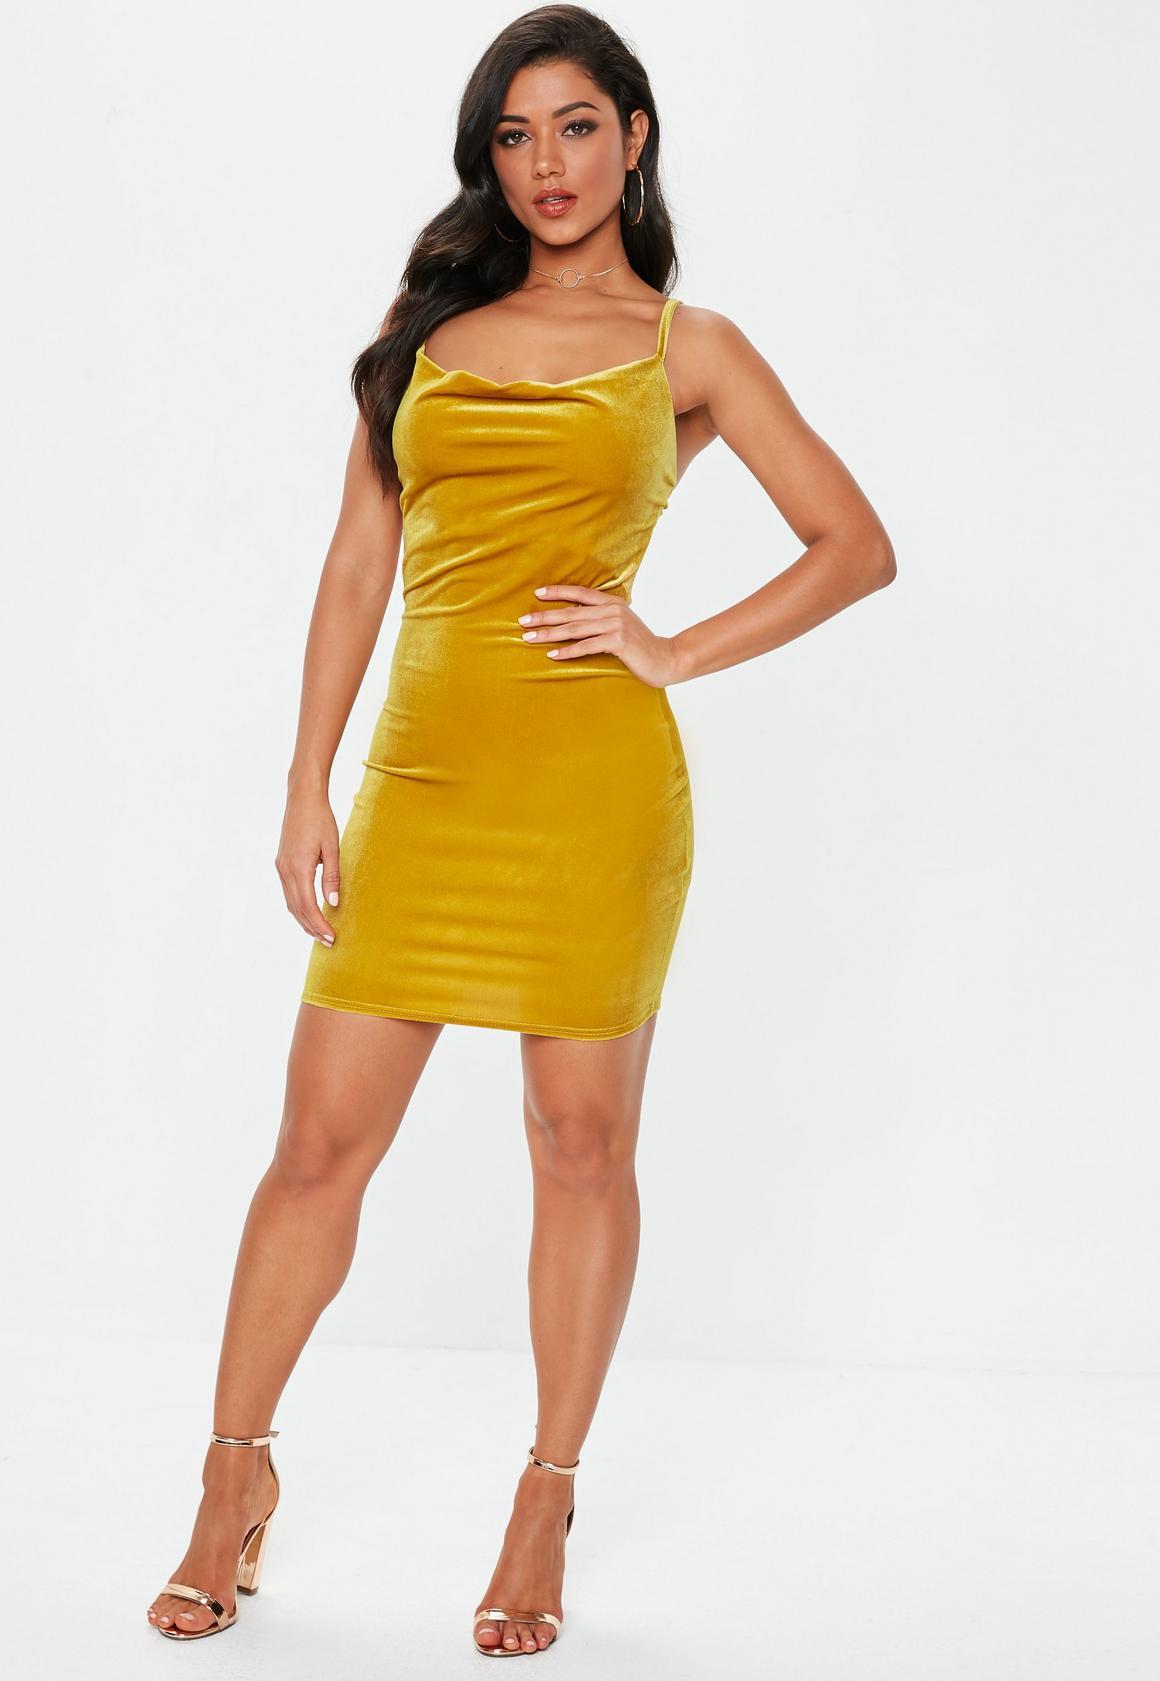 mustard-velvet-cowl-mini-dress.jpg?$product-page__zoom--1x$